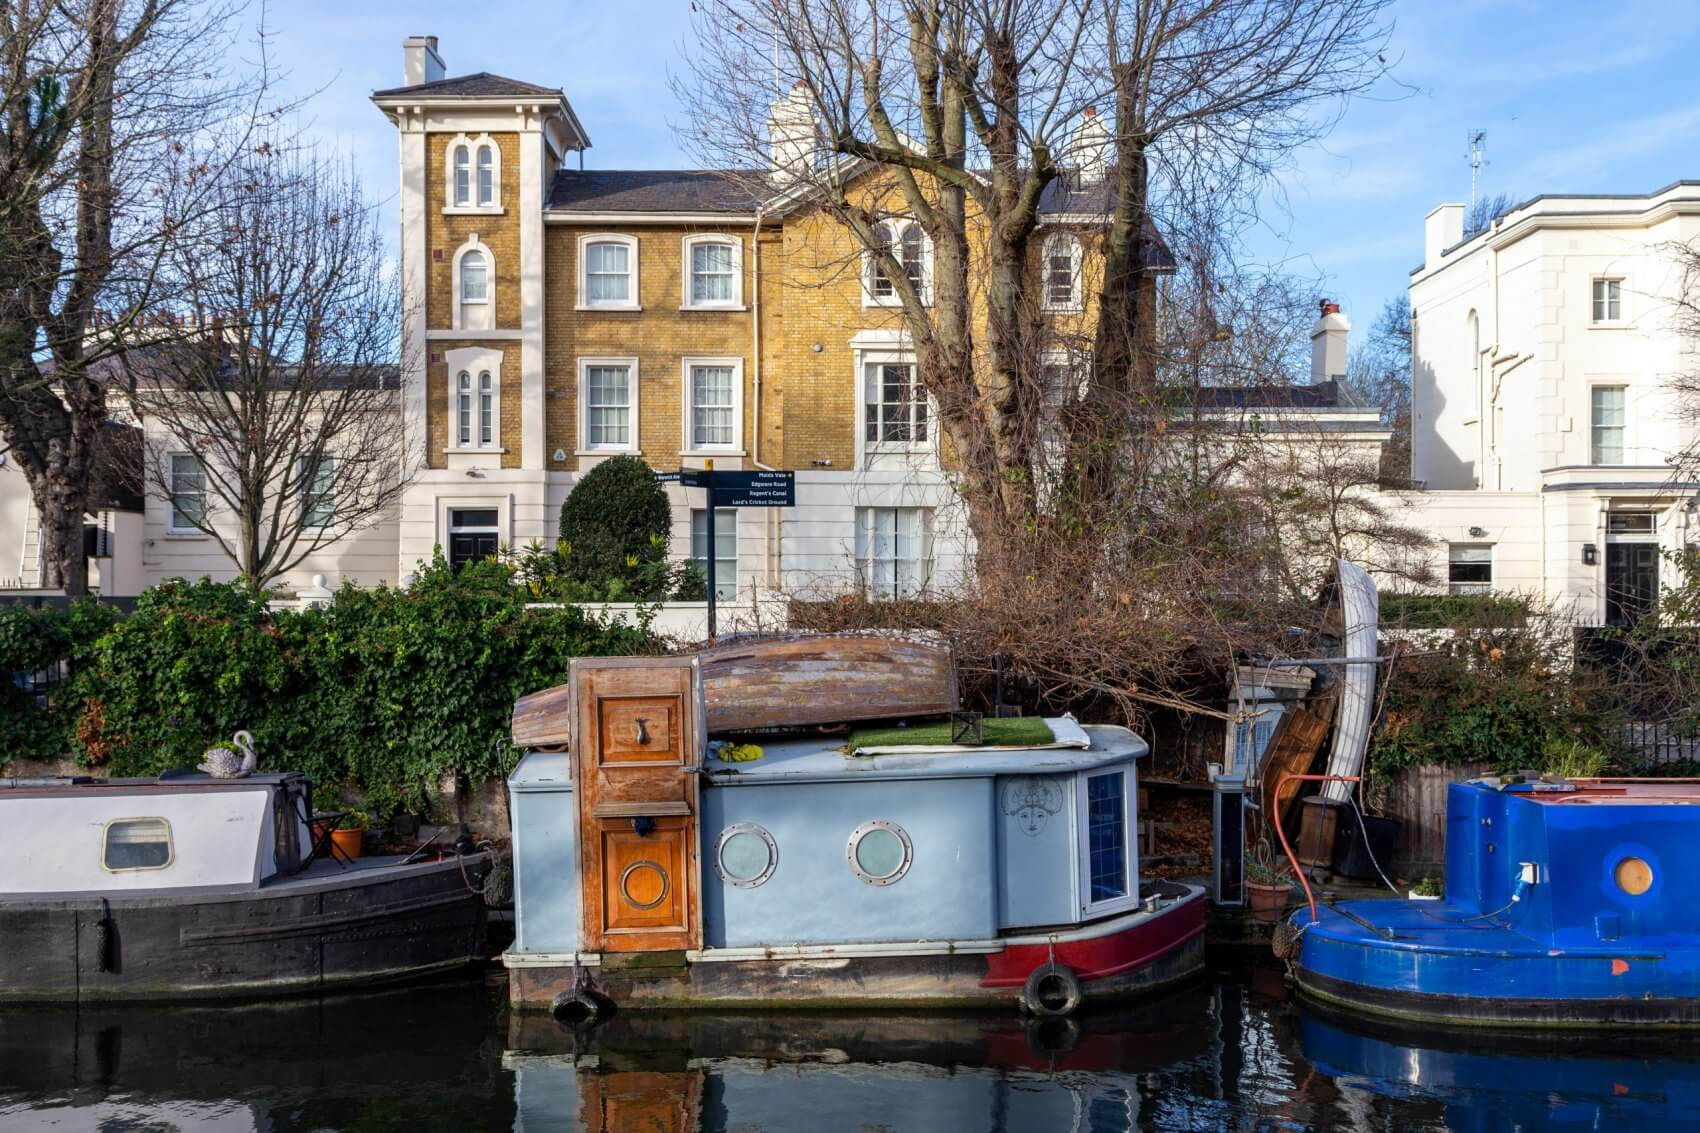 Houseboat Maida Vale